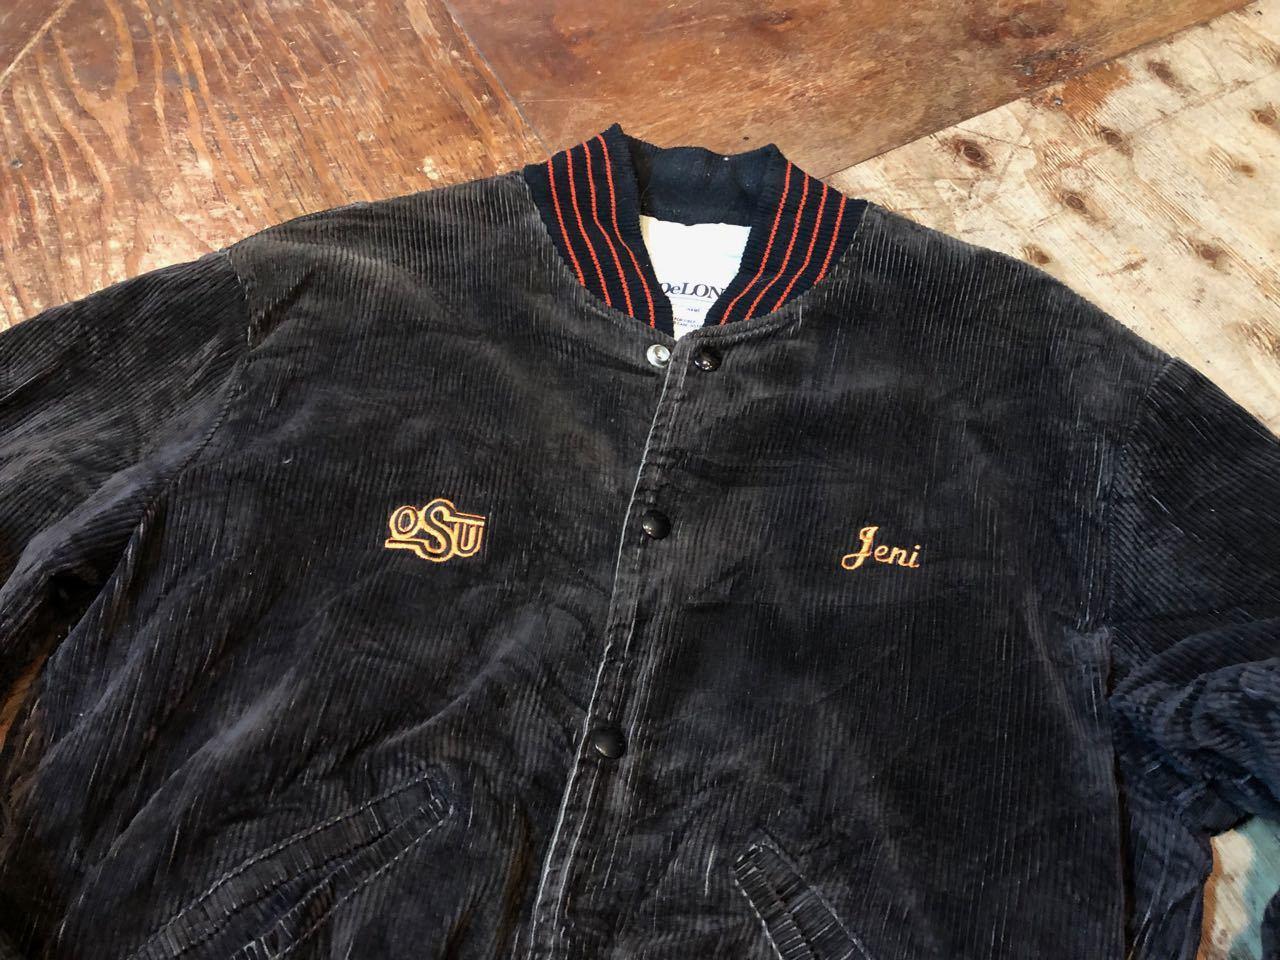 12/28(金)入荷! 80s  Embroidery  DELONG CORDUROY VARSITY JACKET !_c0144020_18452535.jpg